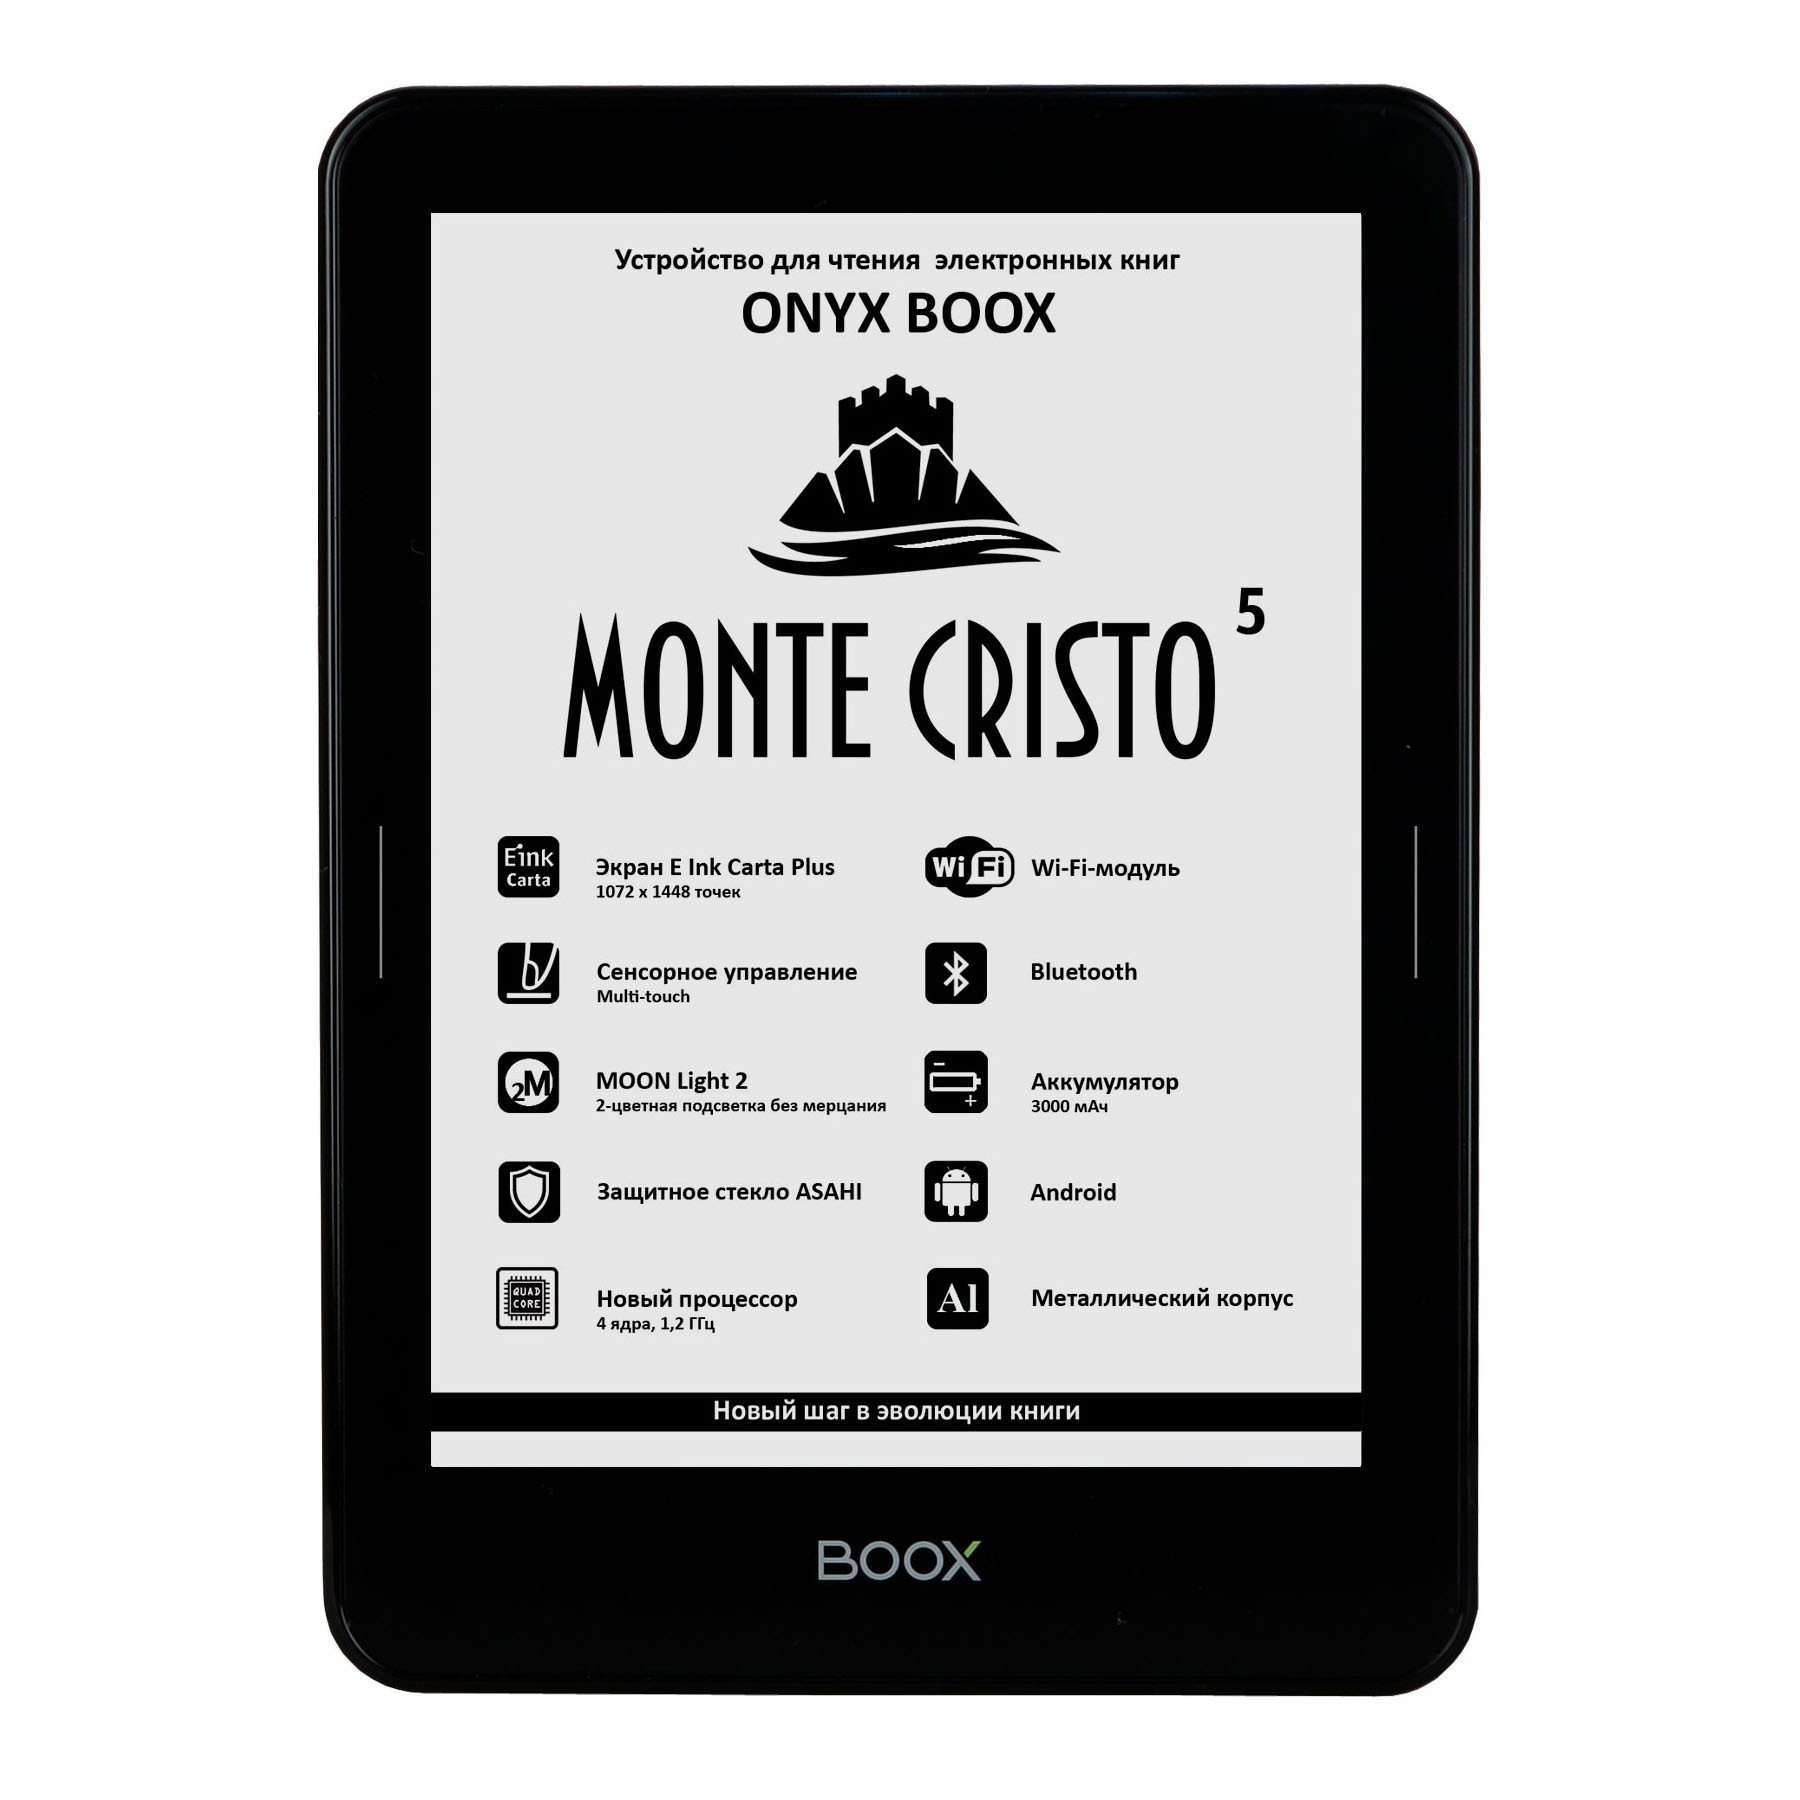 ONYX BOOX Monte Cristo 5 цена